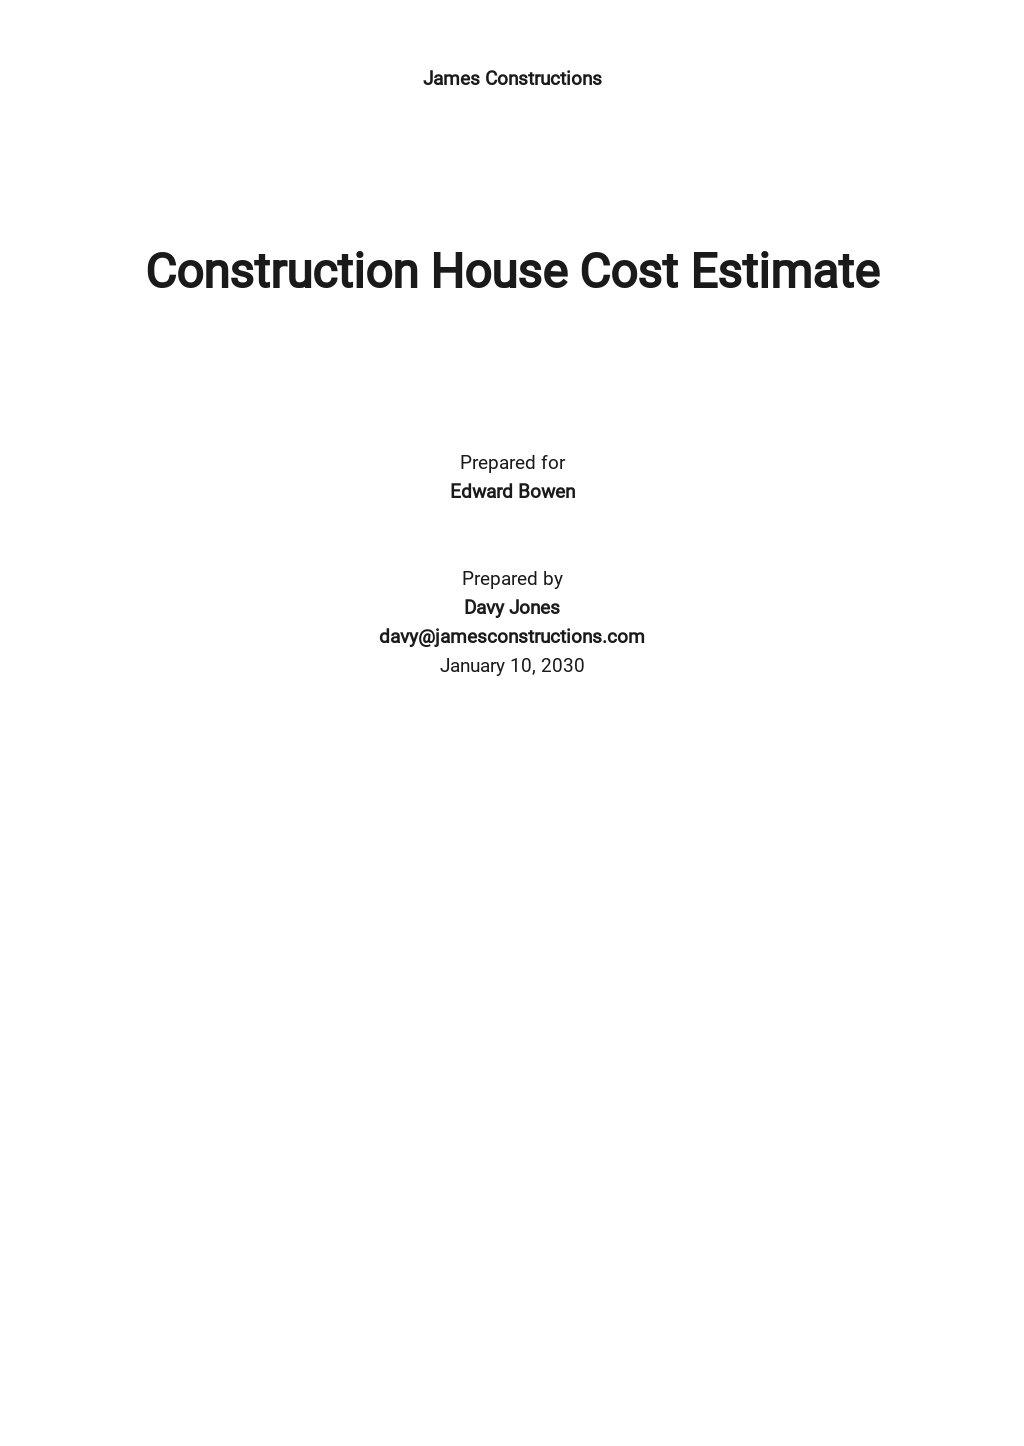 Construction House Cost Estimate Template